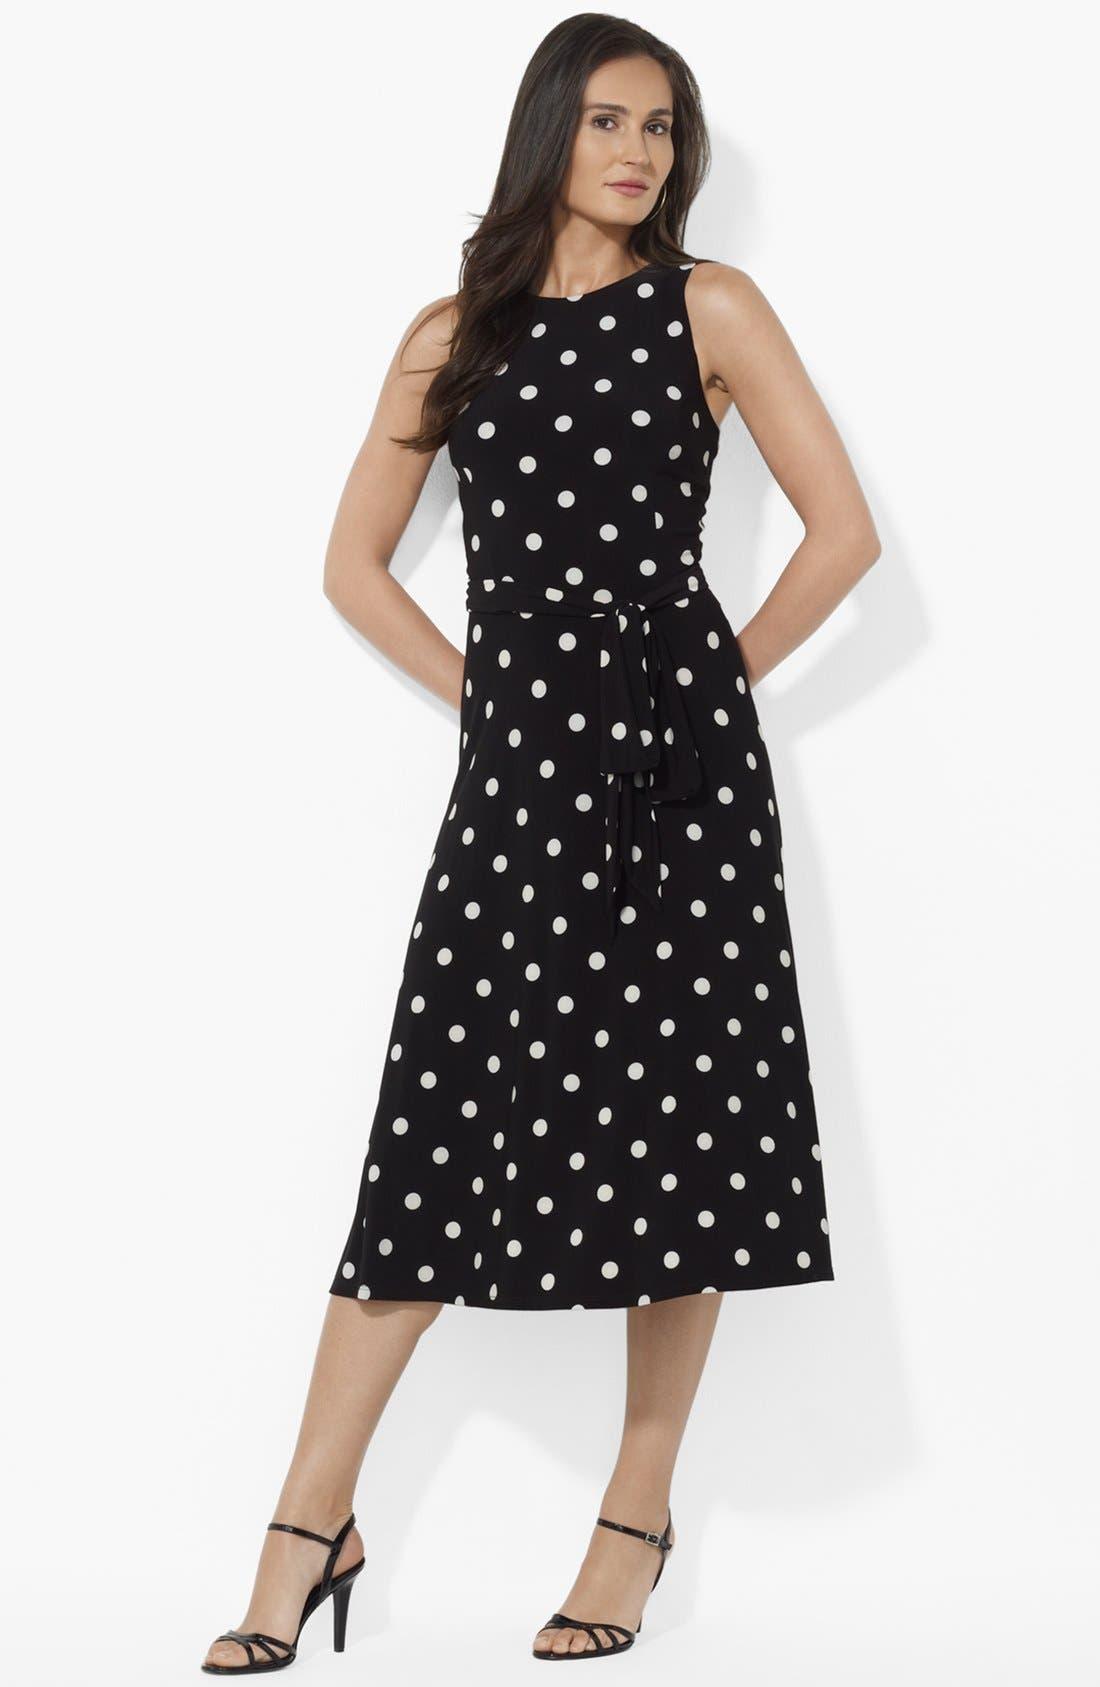 Alternate Image 1 Selected - Lauren Ralph Lauren Polka Dot Matte Jersey Dress